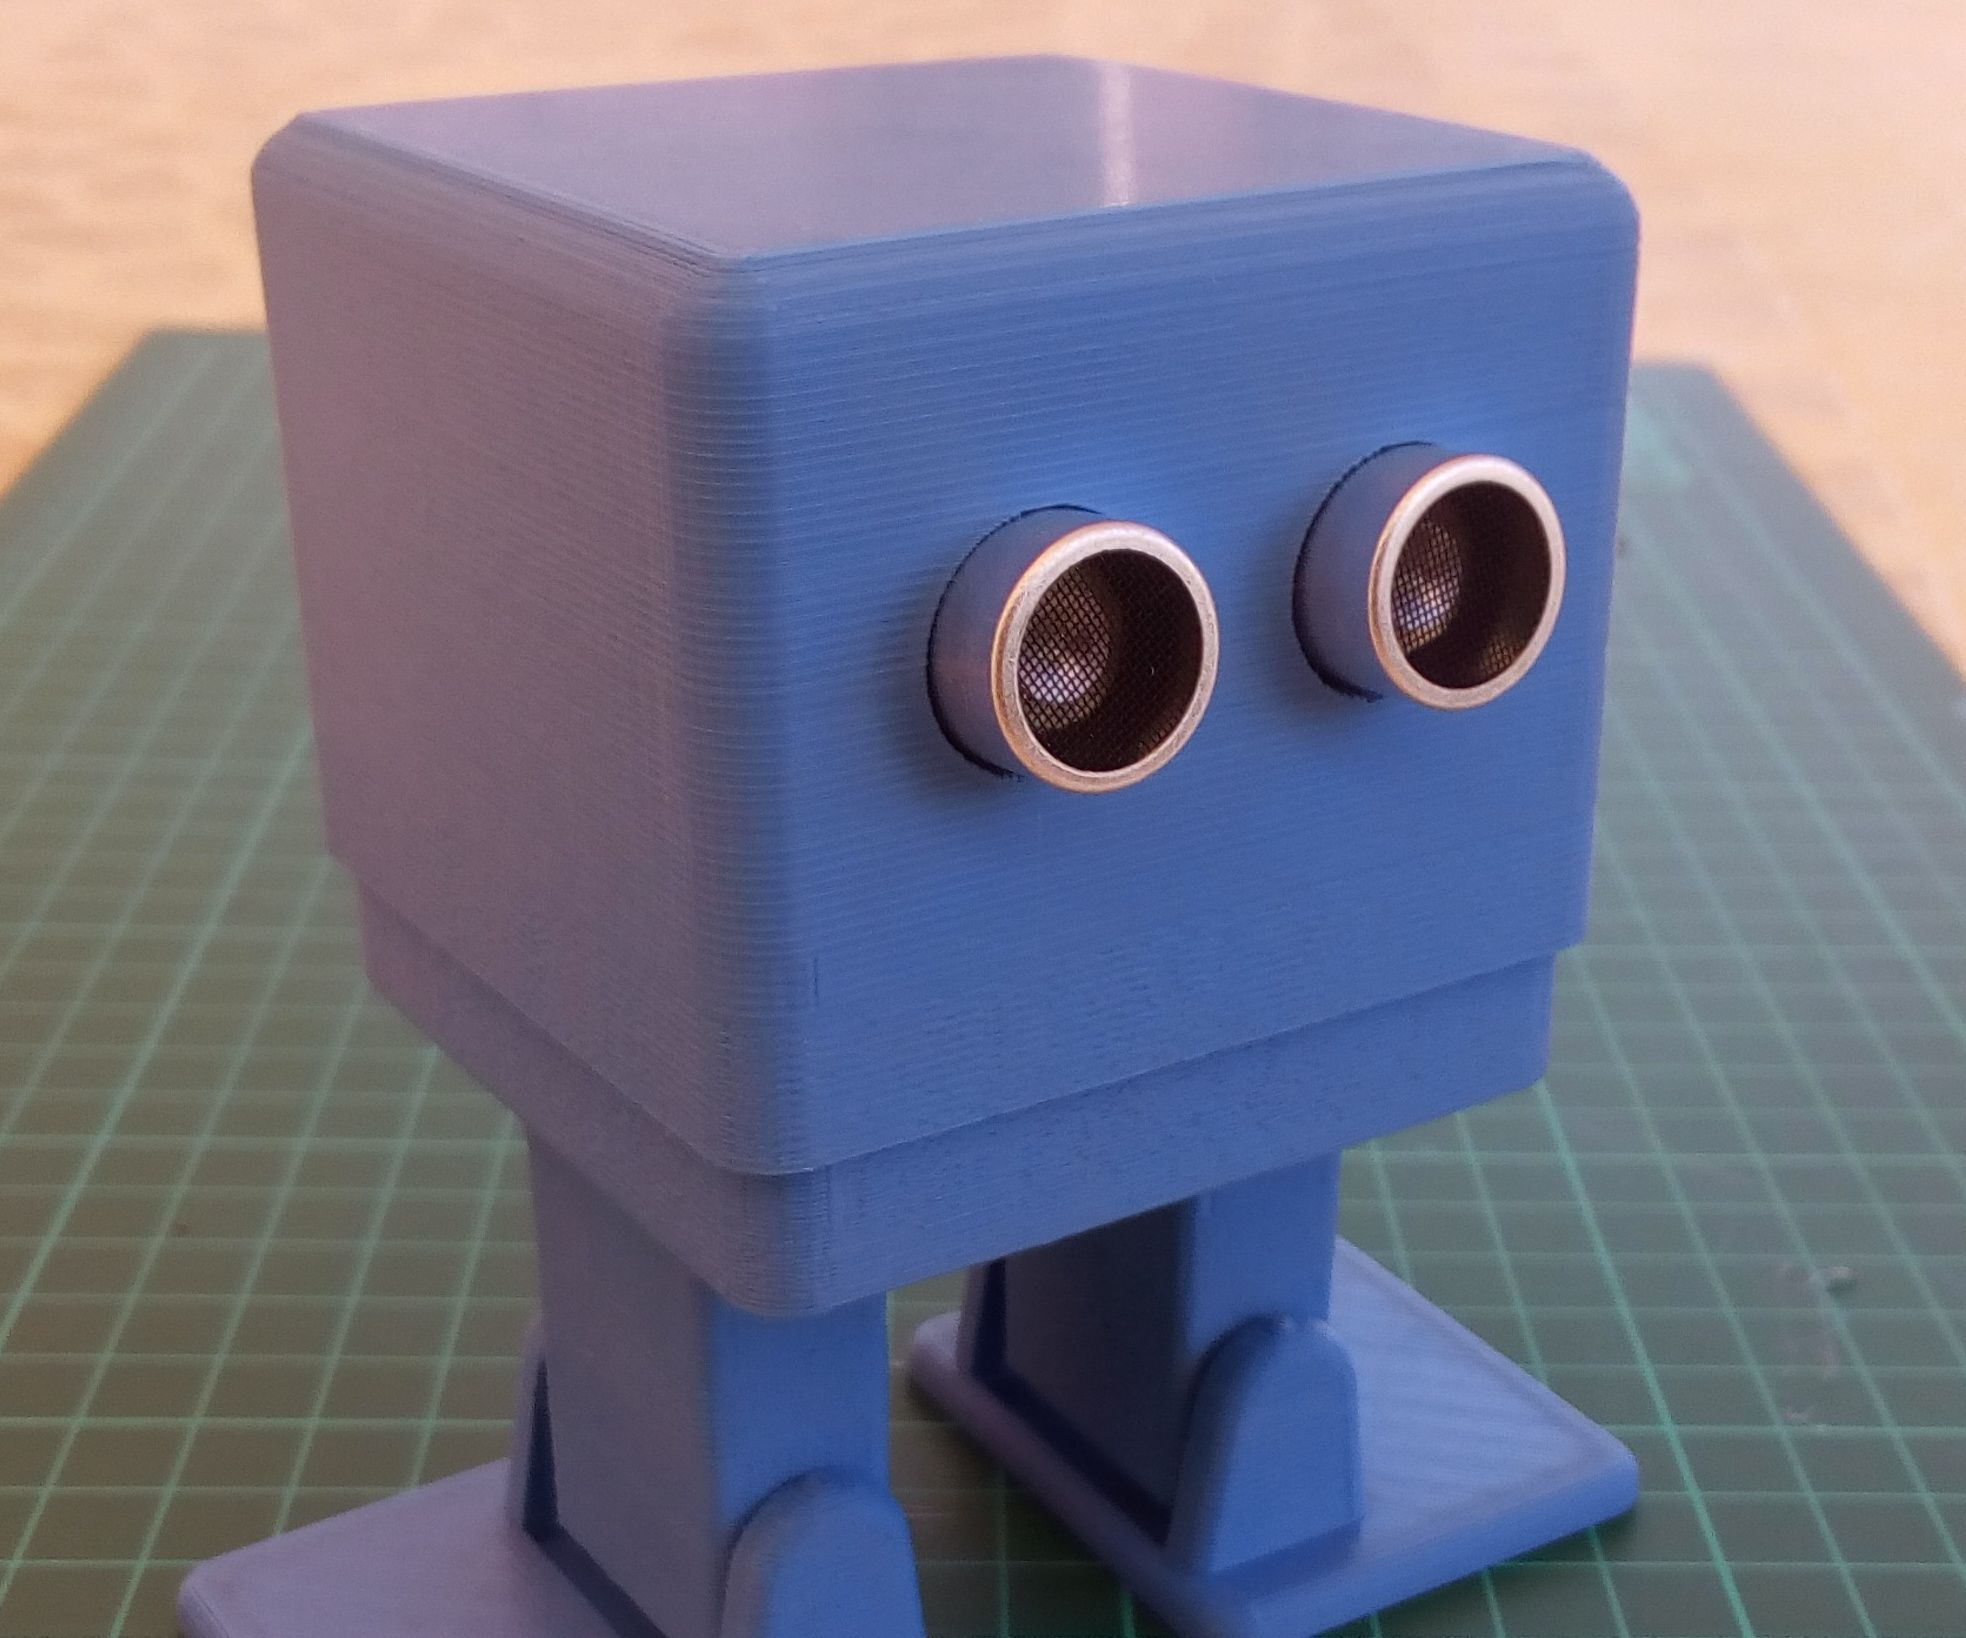 MiniZowi bluetooth dancer controled robot.